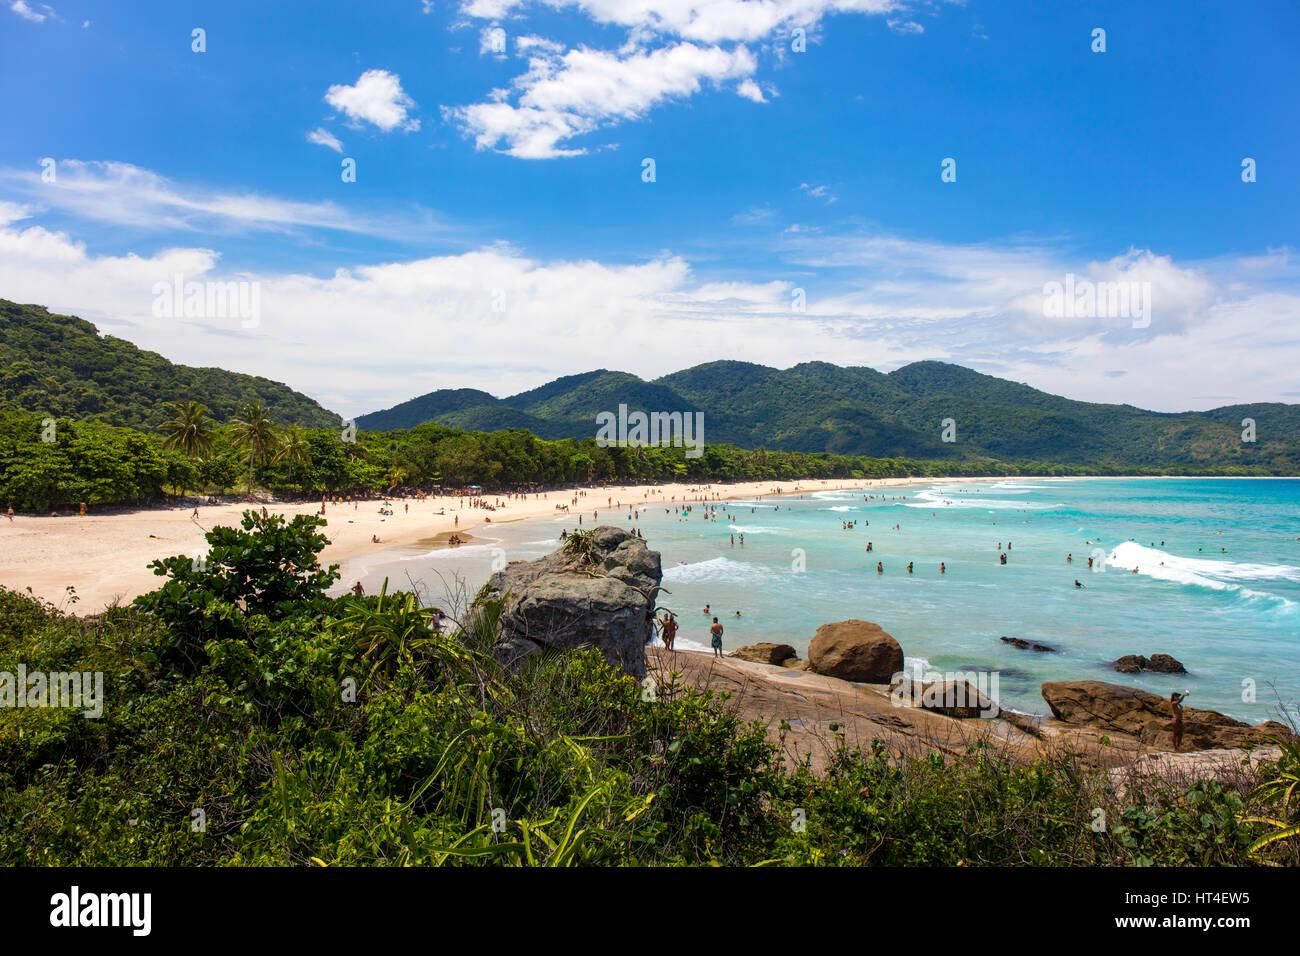 Lopes Mendes beach. Ilha Grande, RJ, Brasile. Immagini Stock